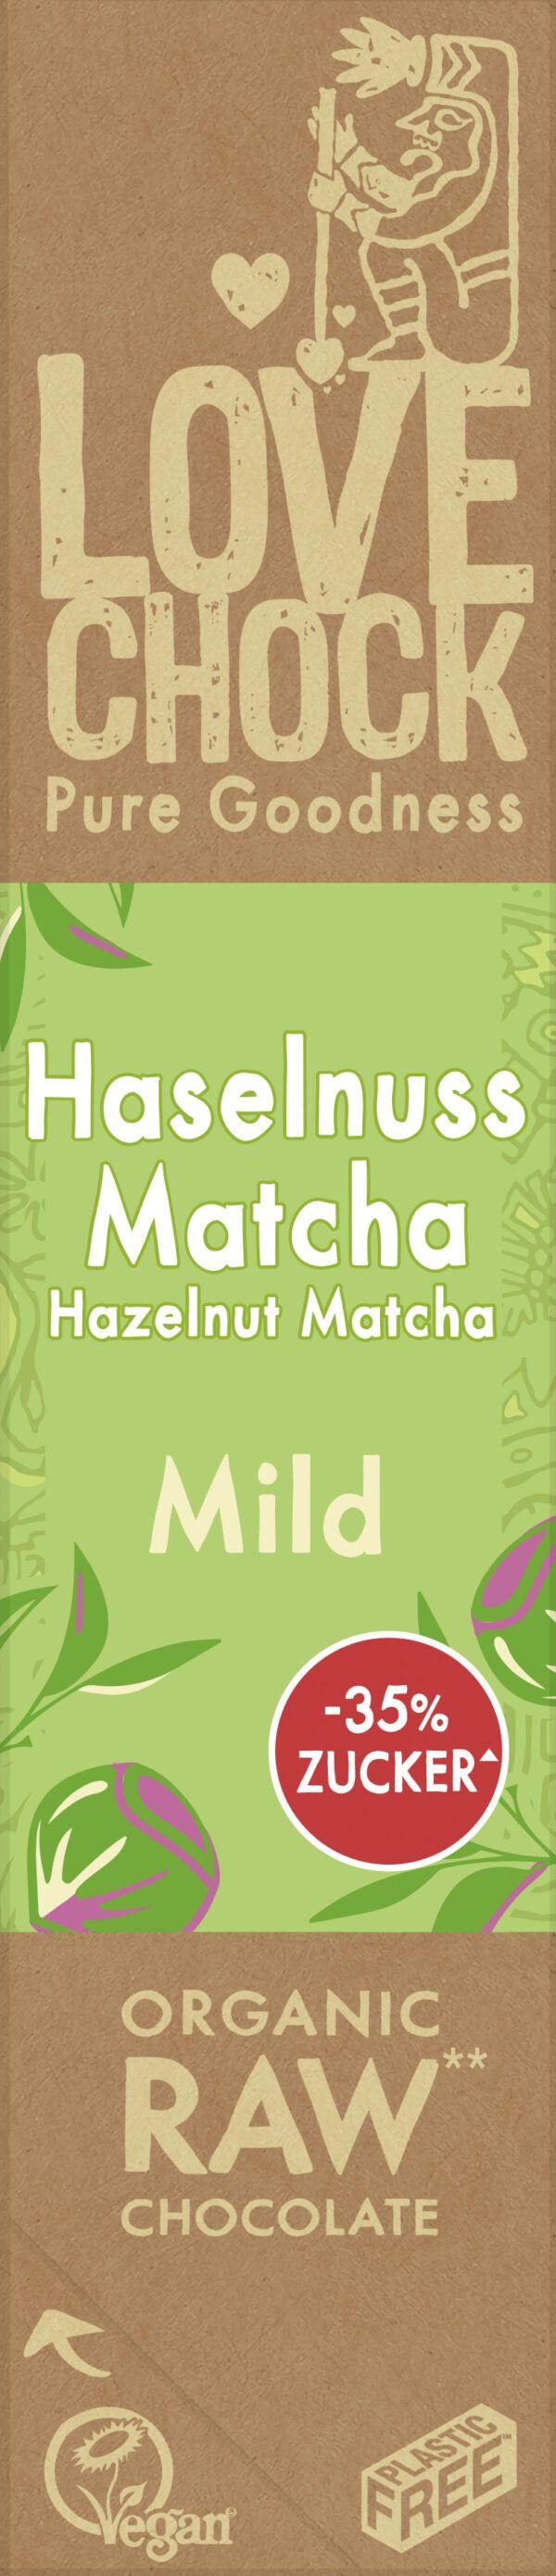 Lovechock B.V. Lovechock Riegel Mild Haselnuss Matcha 65 % 12x40g